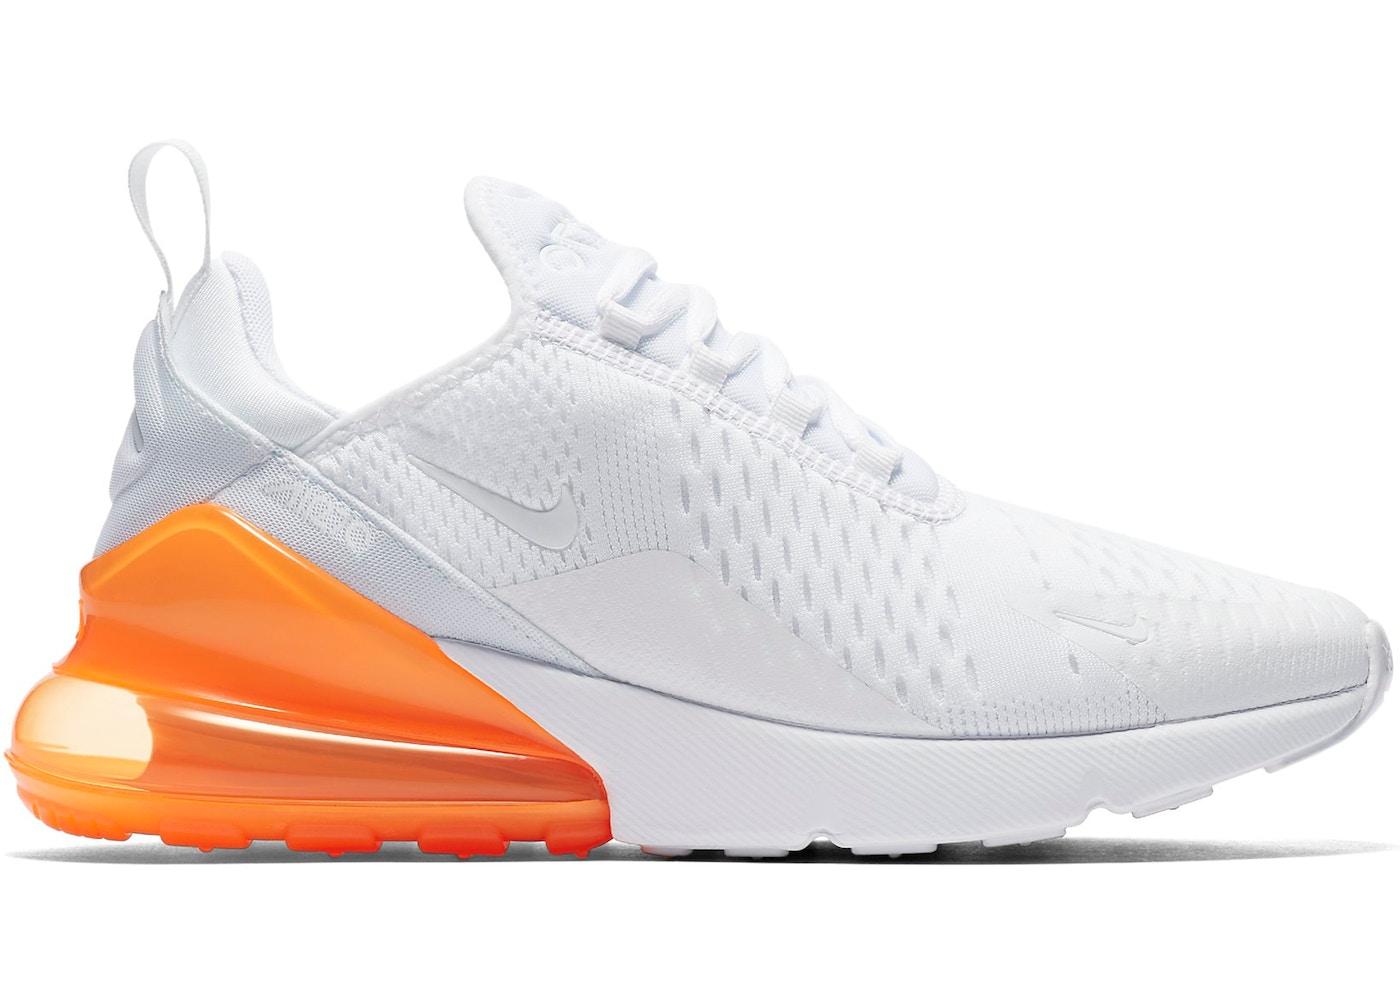 Nike Air Max 270 White Pack (Total Orange)